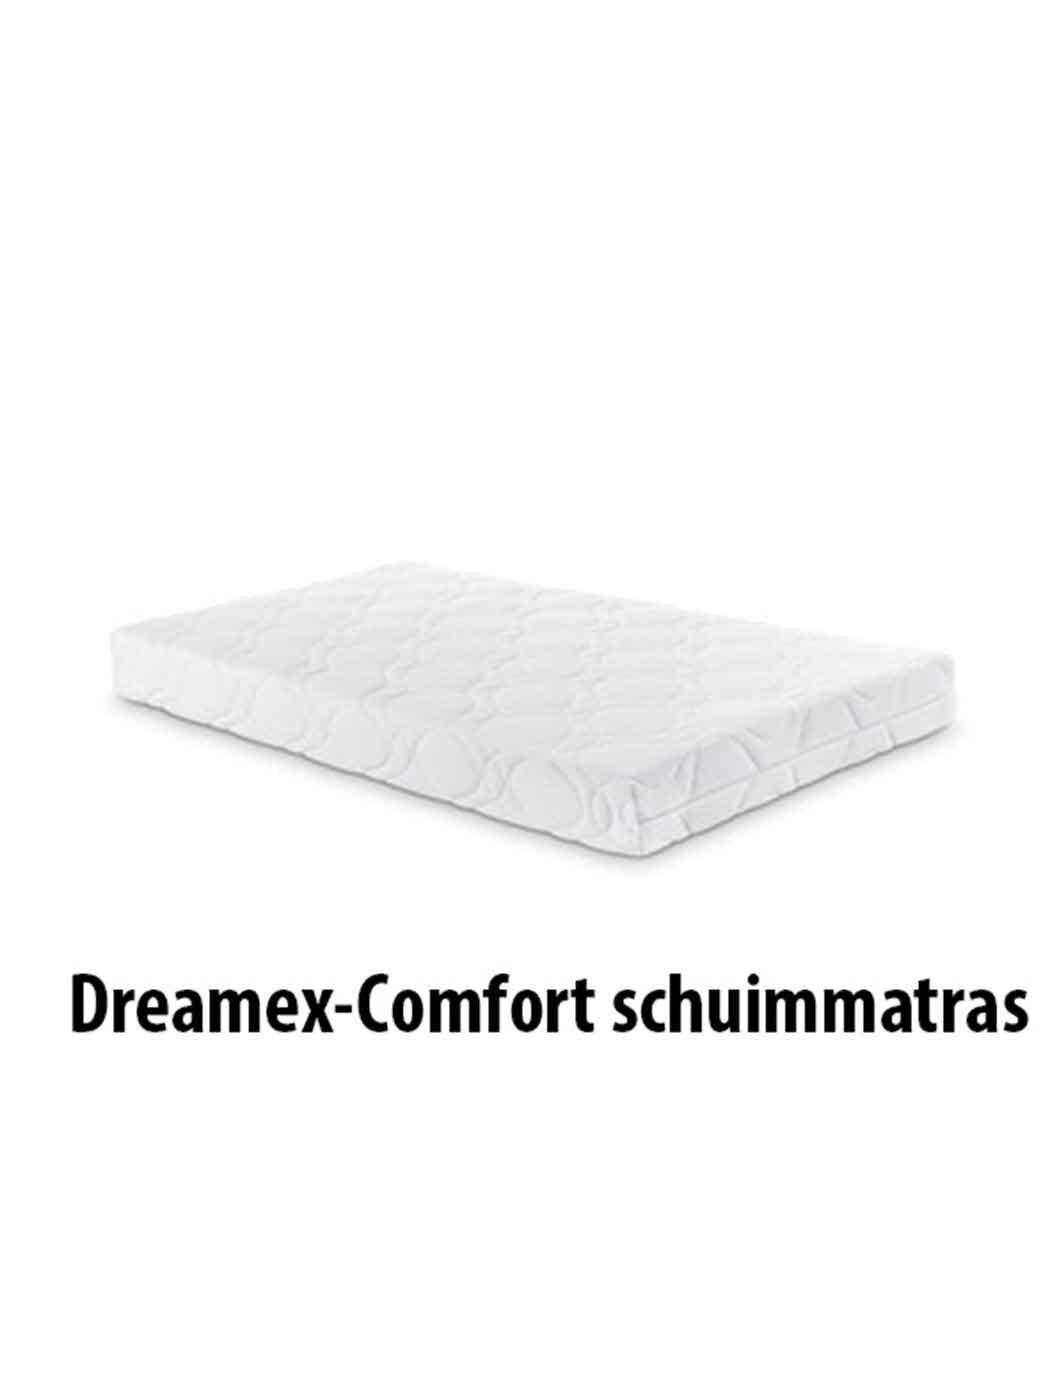 Dreamex-Comfort-Schuimmatras